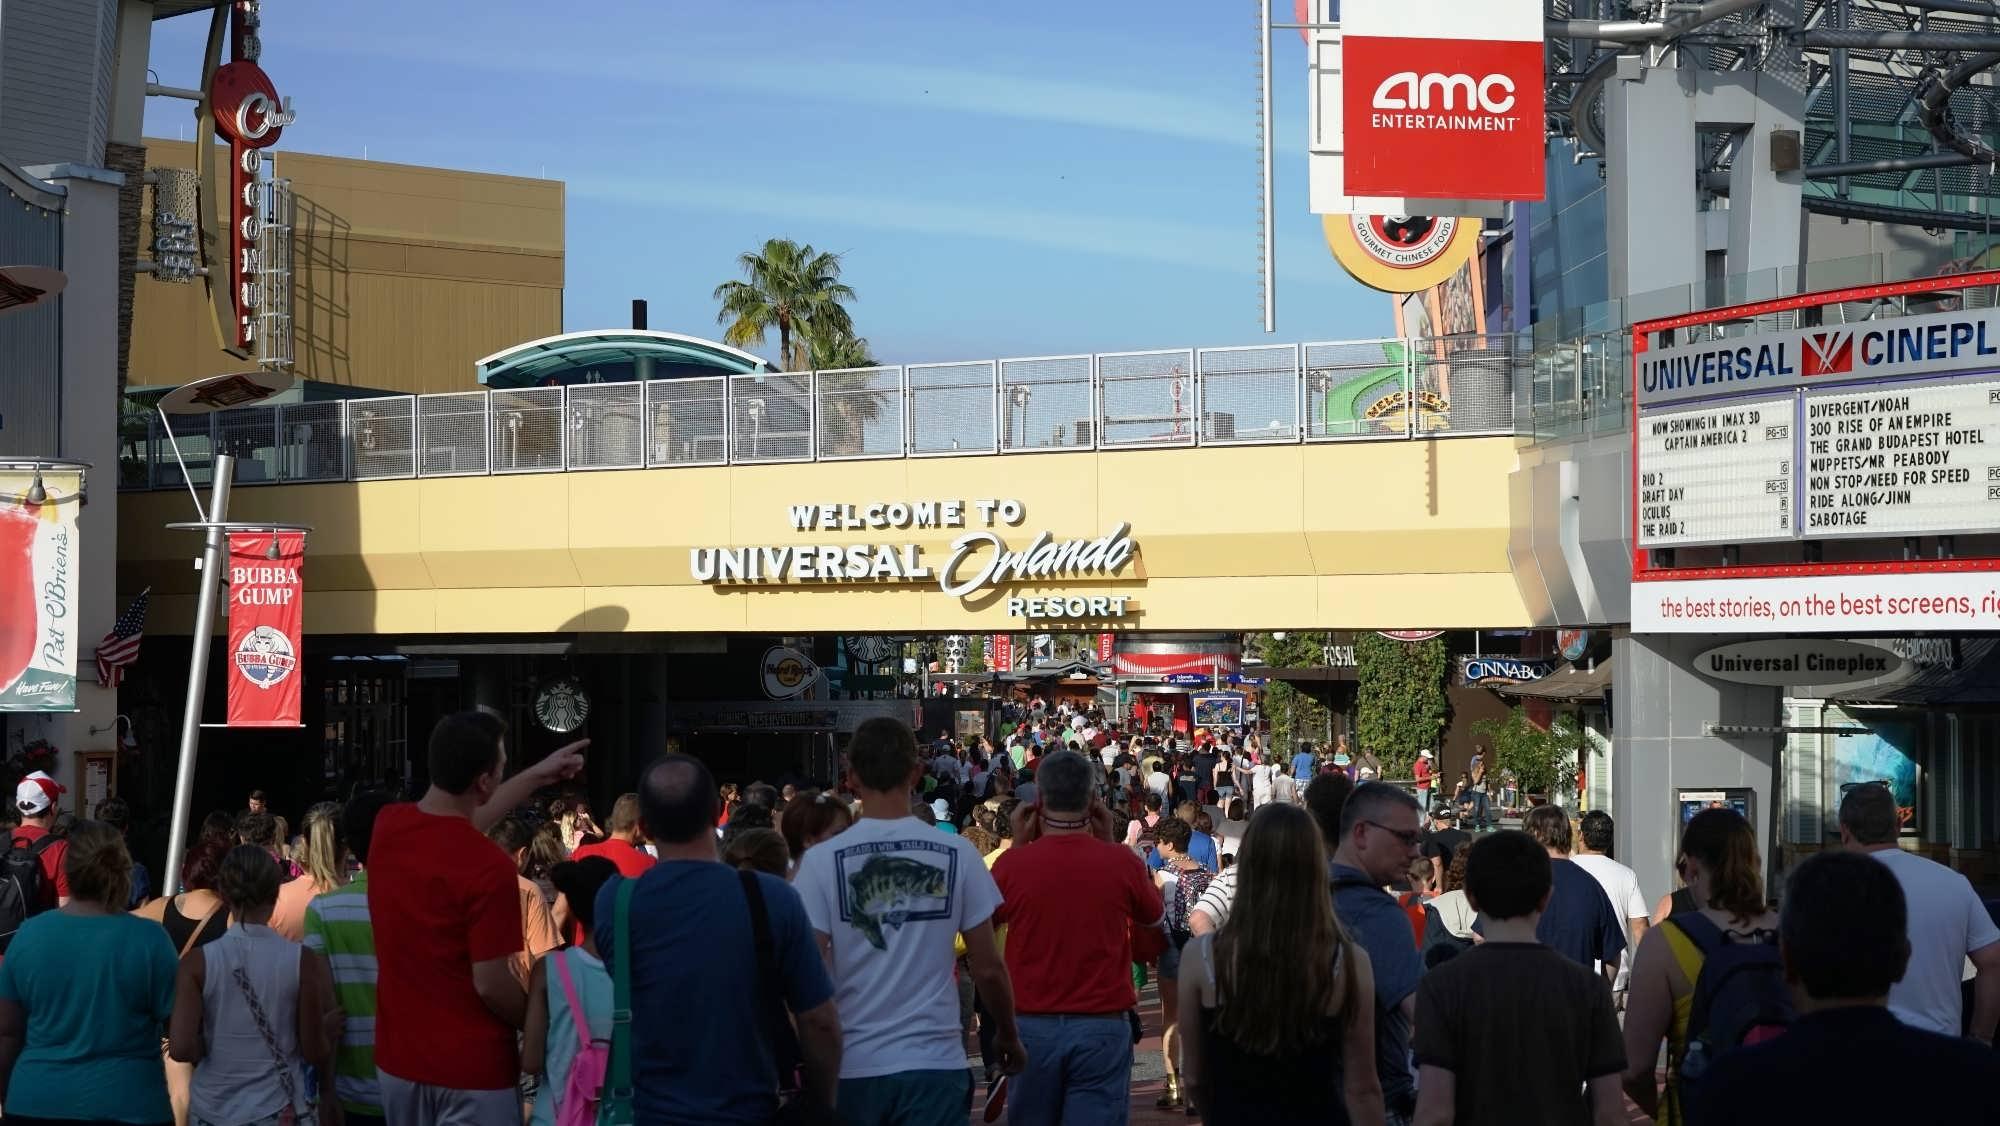 Entering Universal Orlando's CityWalk.